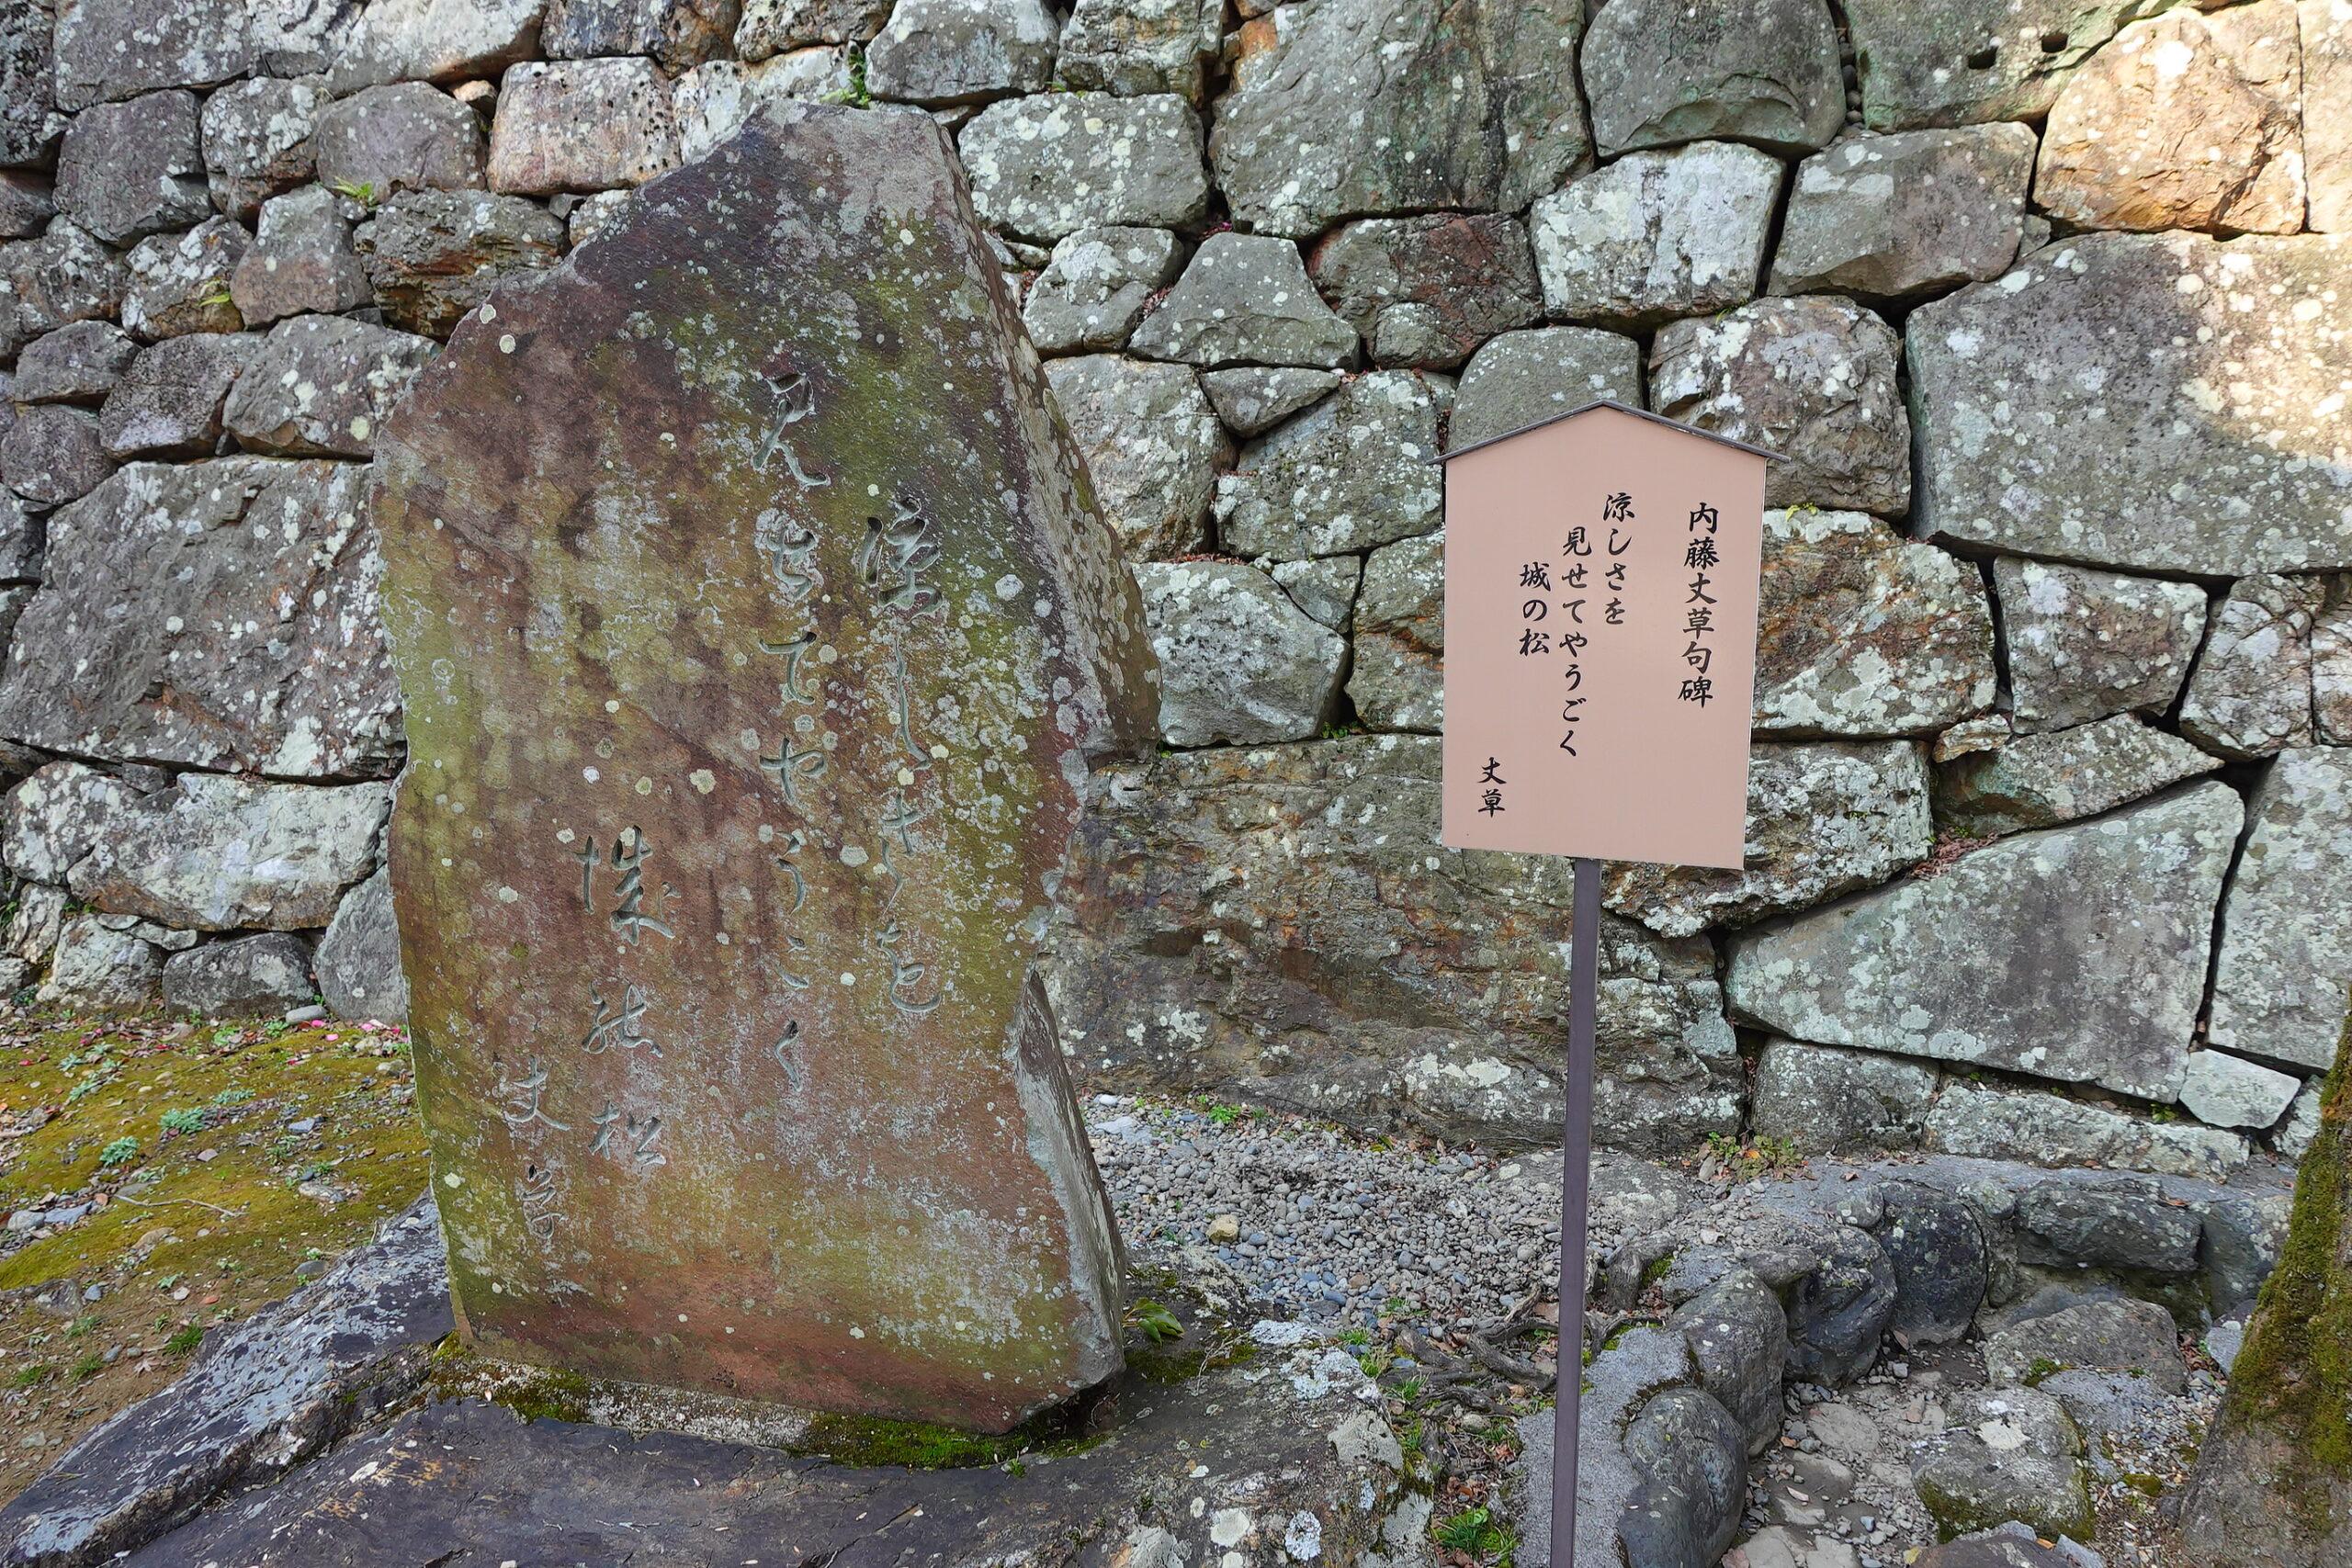 犬山城石積み